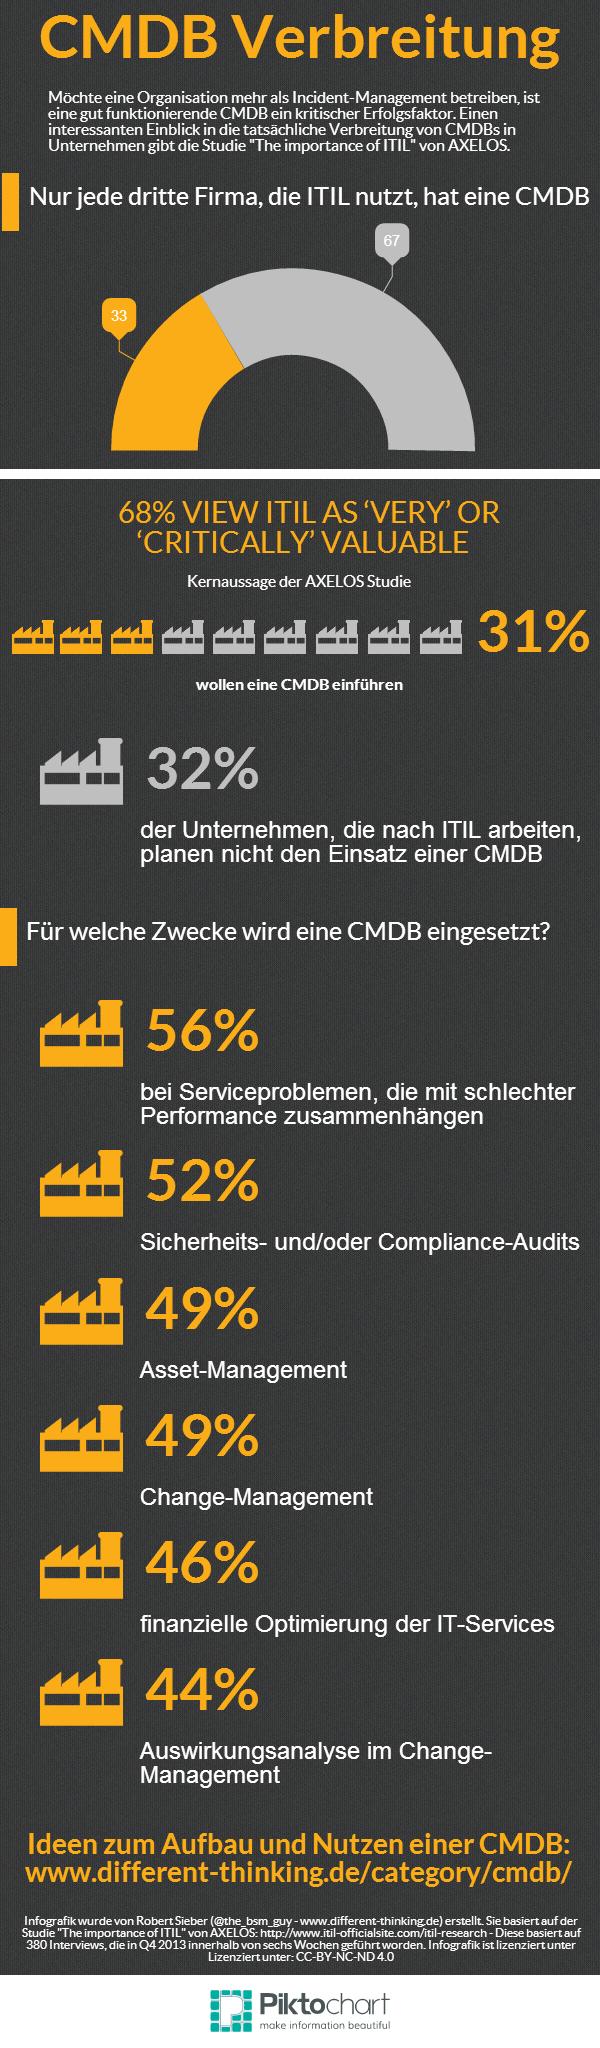 Inforgrafik CMDB Verbreitung